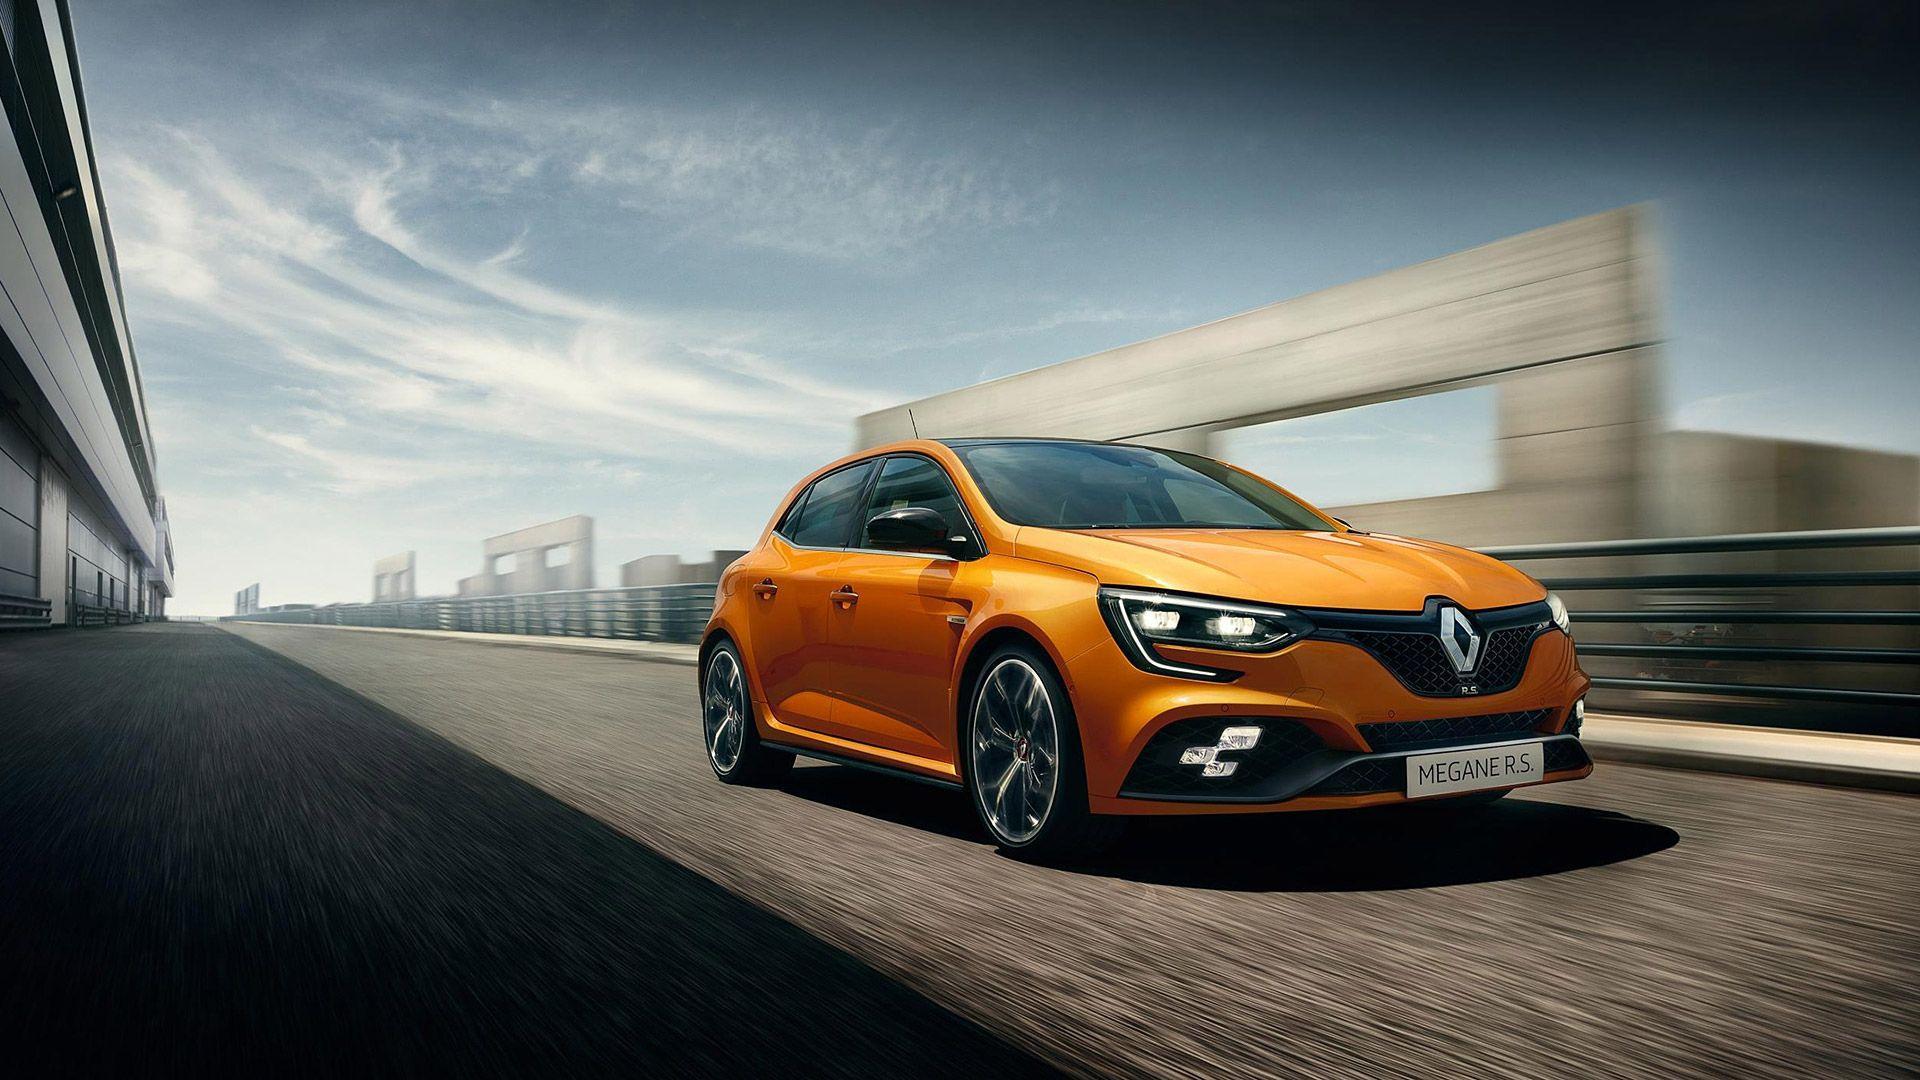 Renault Megane Rs Wallpapers Top Free Renault Megane Rs Backgrounds Wallpaperaccess Hd wallpaper renault megane orange car